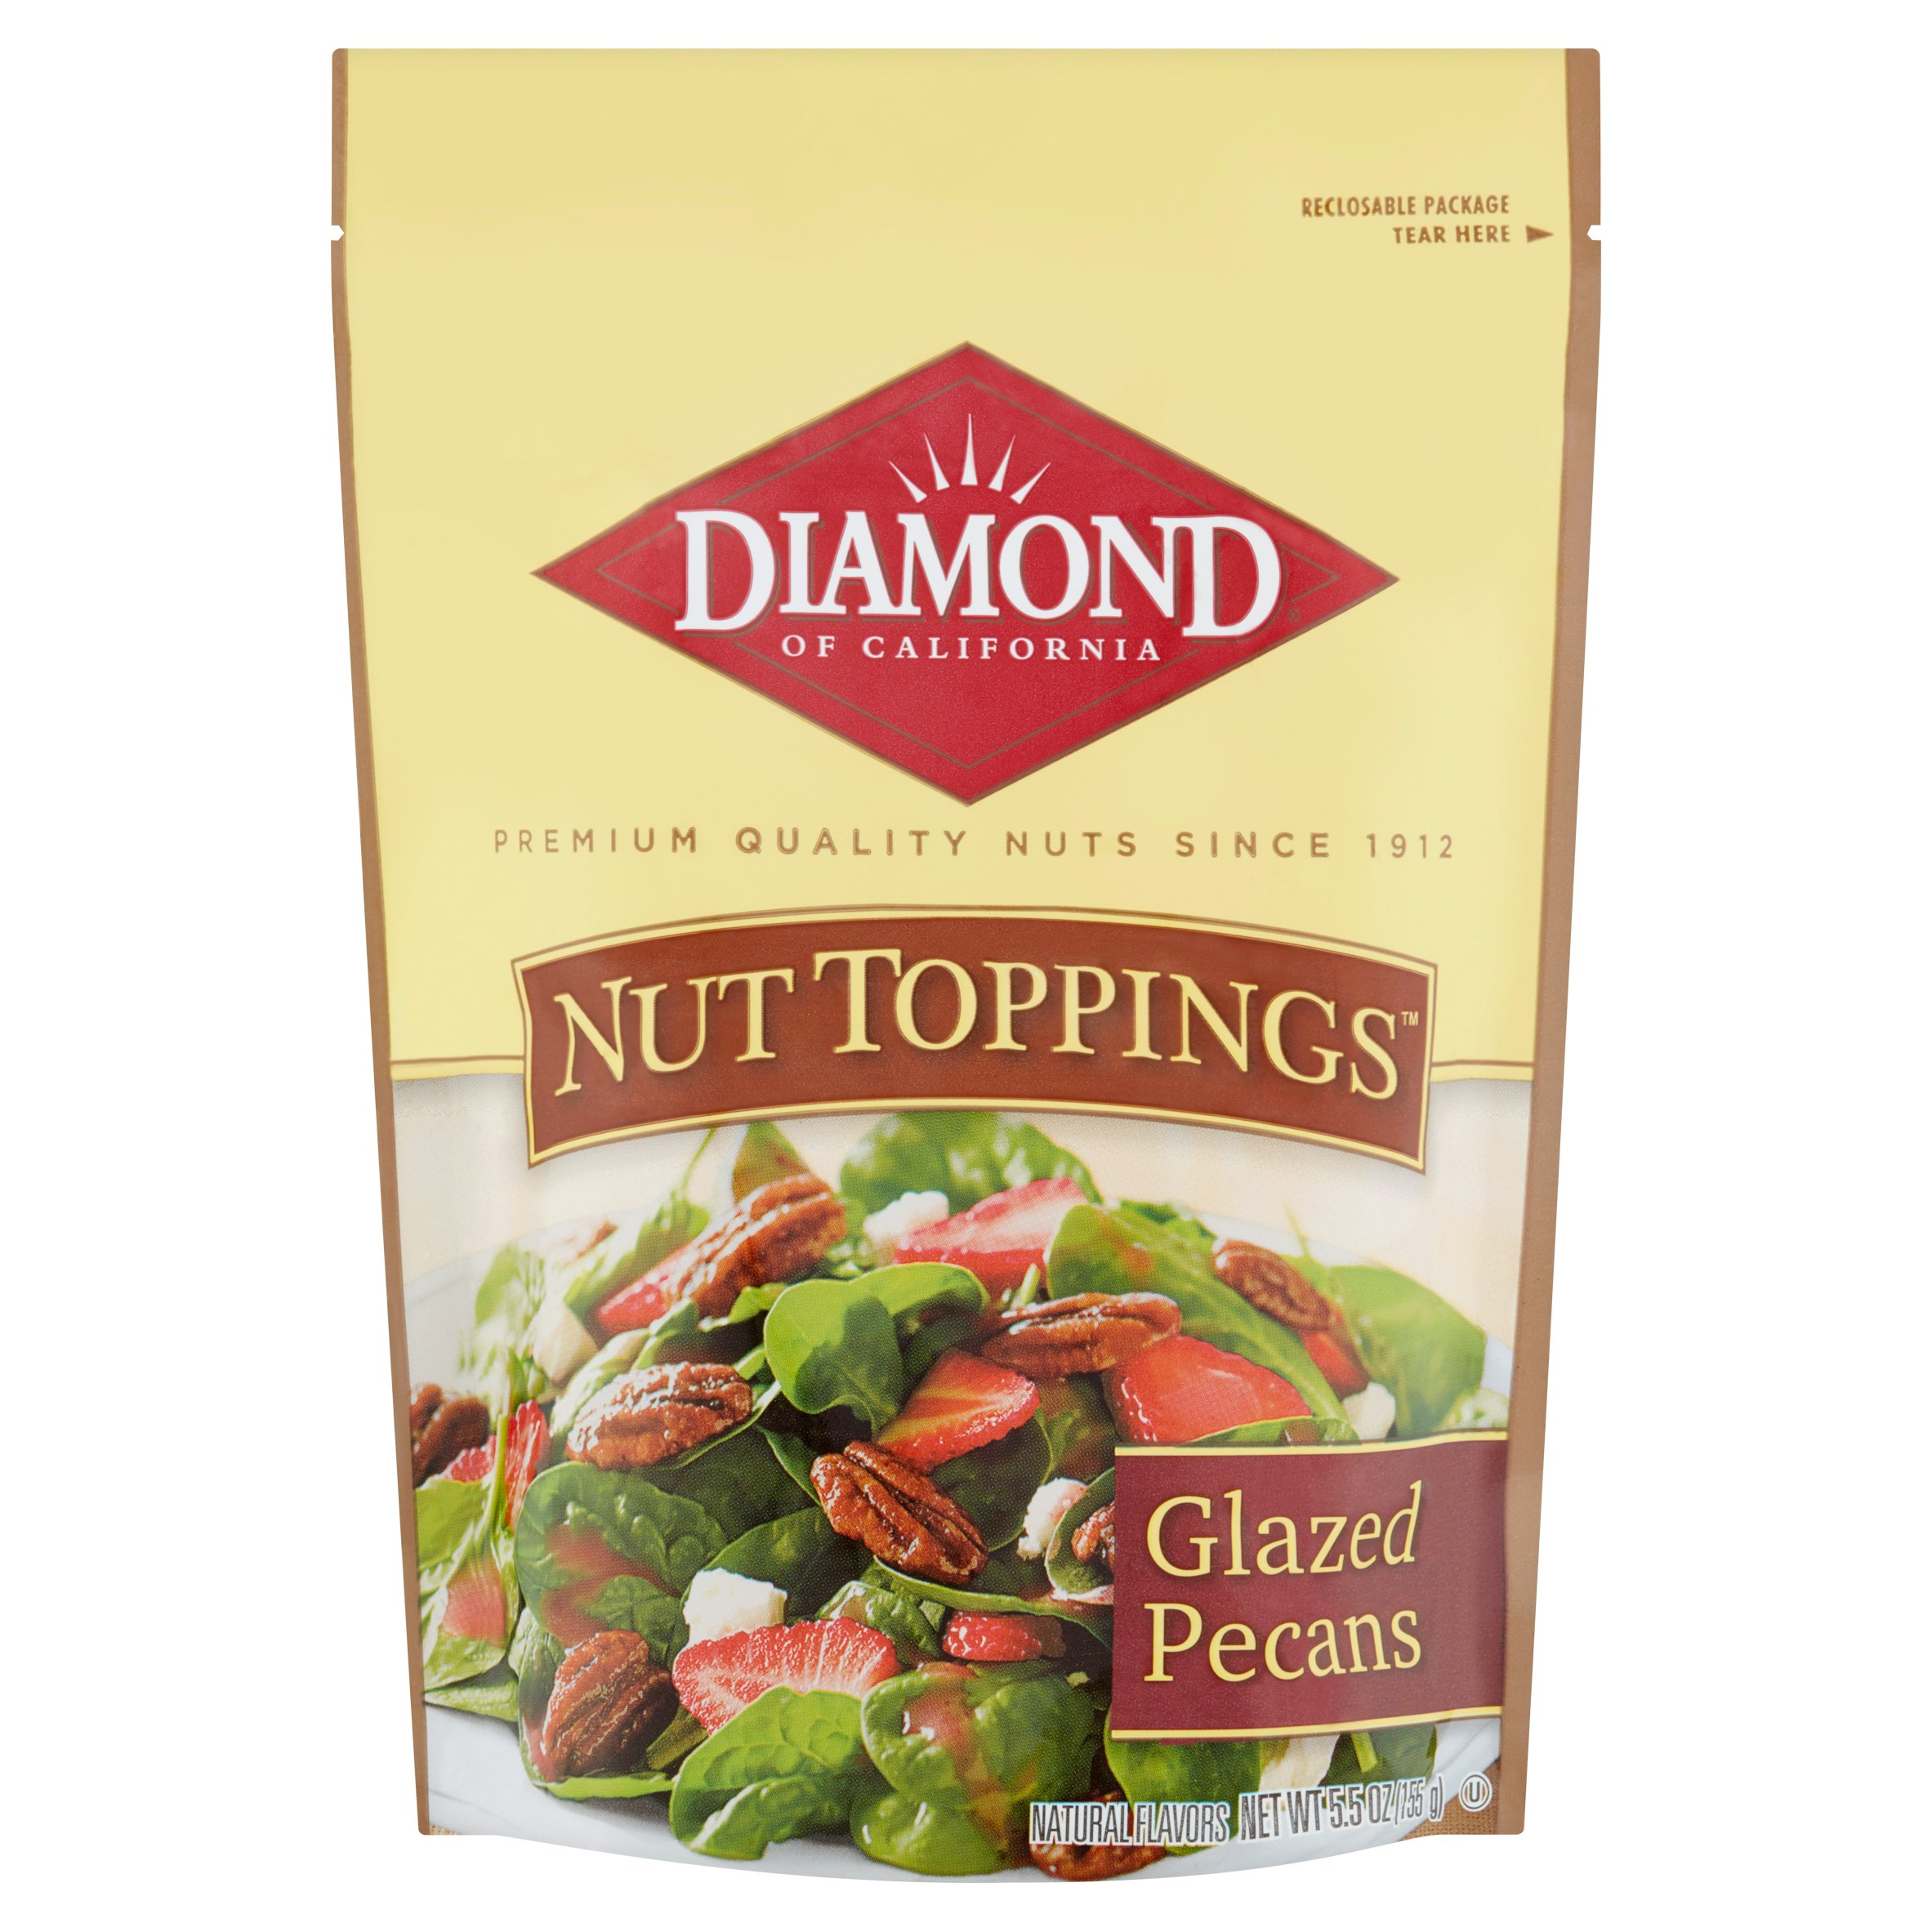 Diamond Of California Harvest Reserve Glazed Pecans, 5.5 OZ by Diamond Foods, Inc.